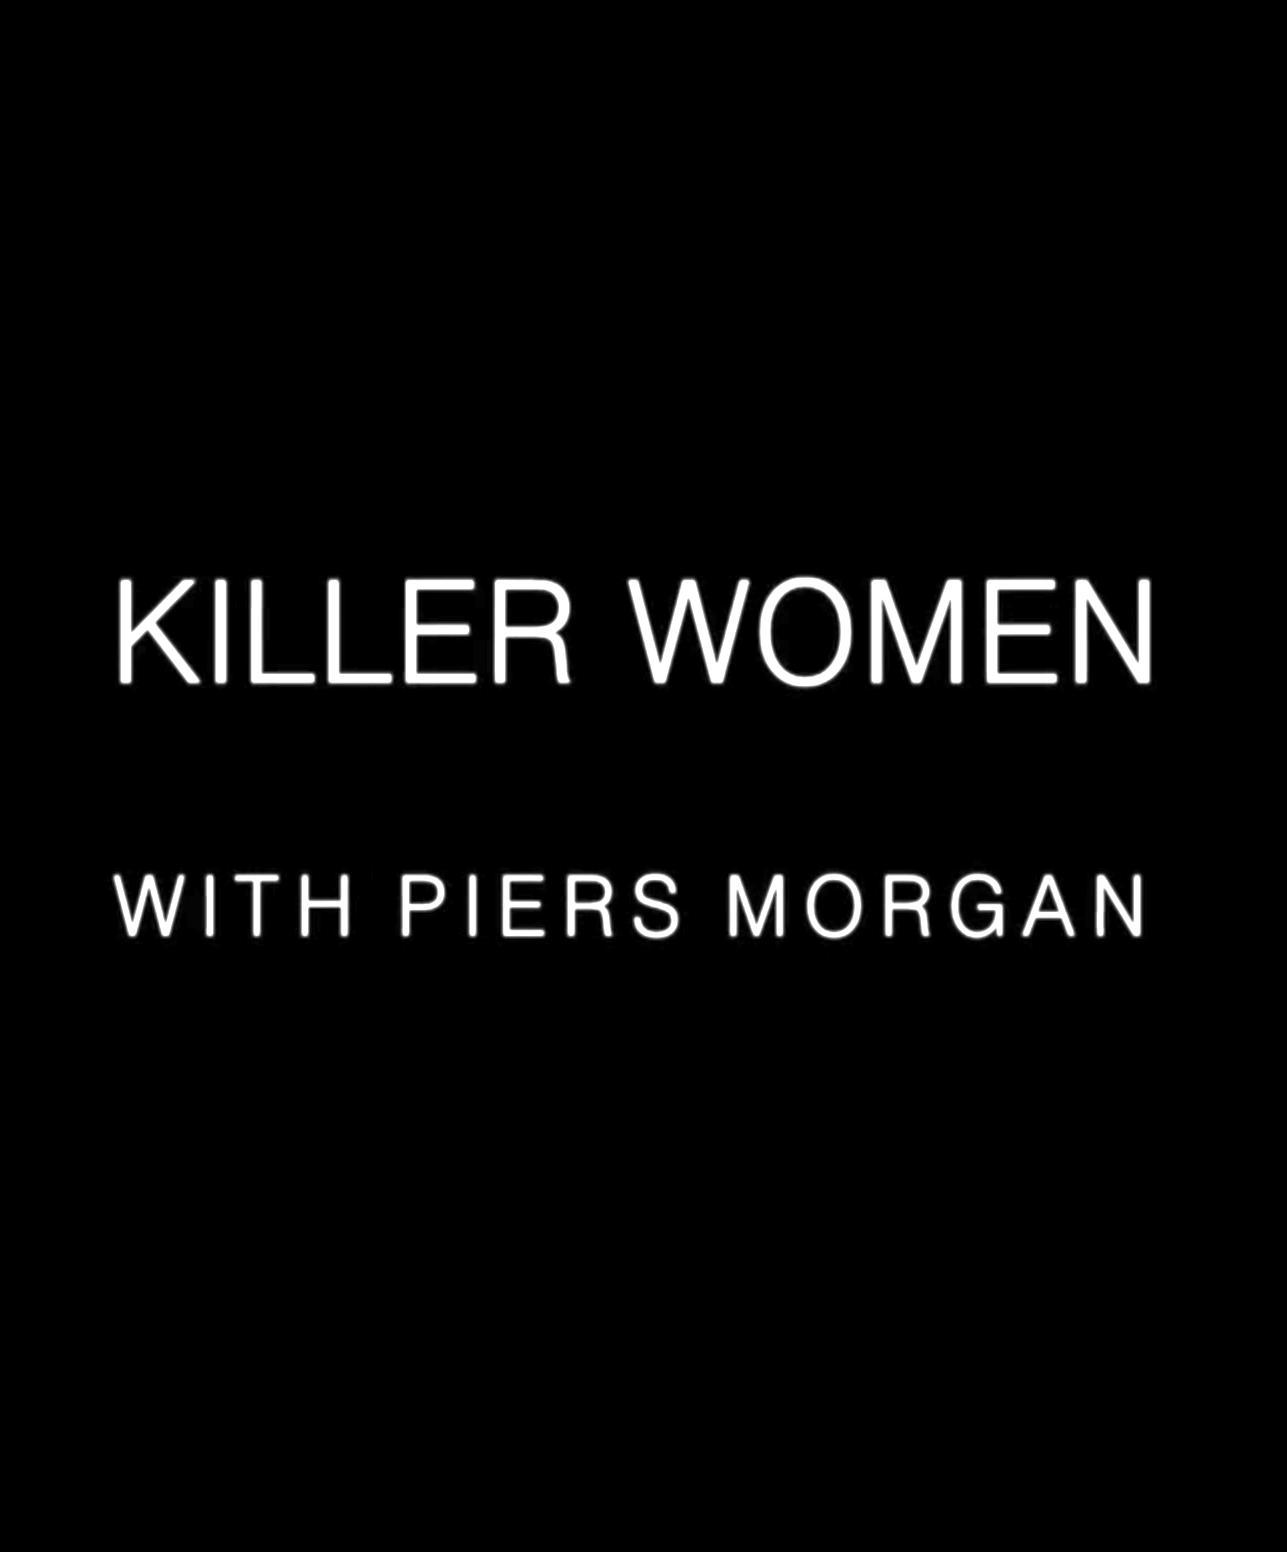 Killer Women with Piers Morgan (TV Series 2016–2017) - IMDb